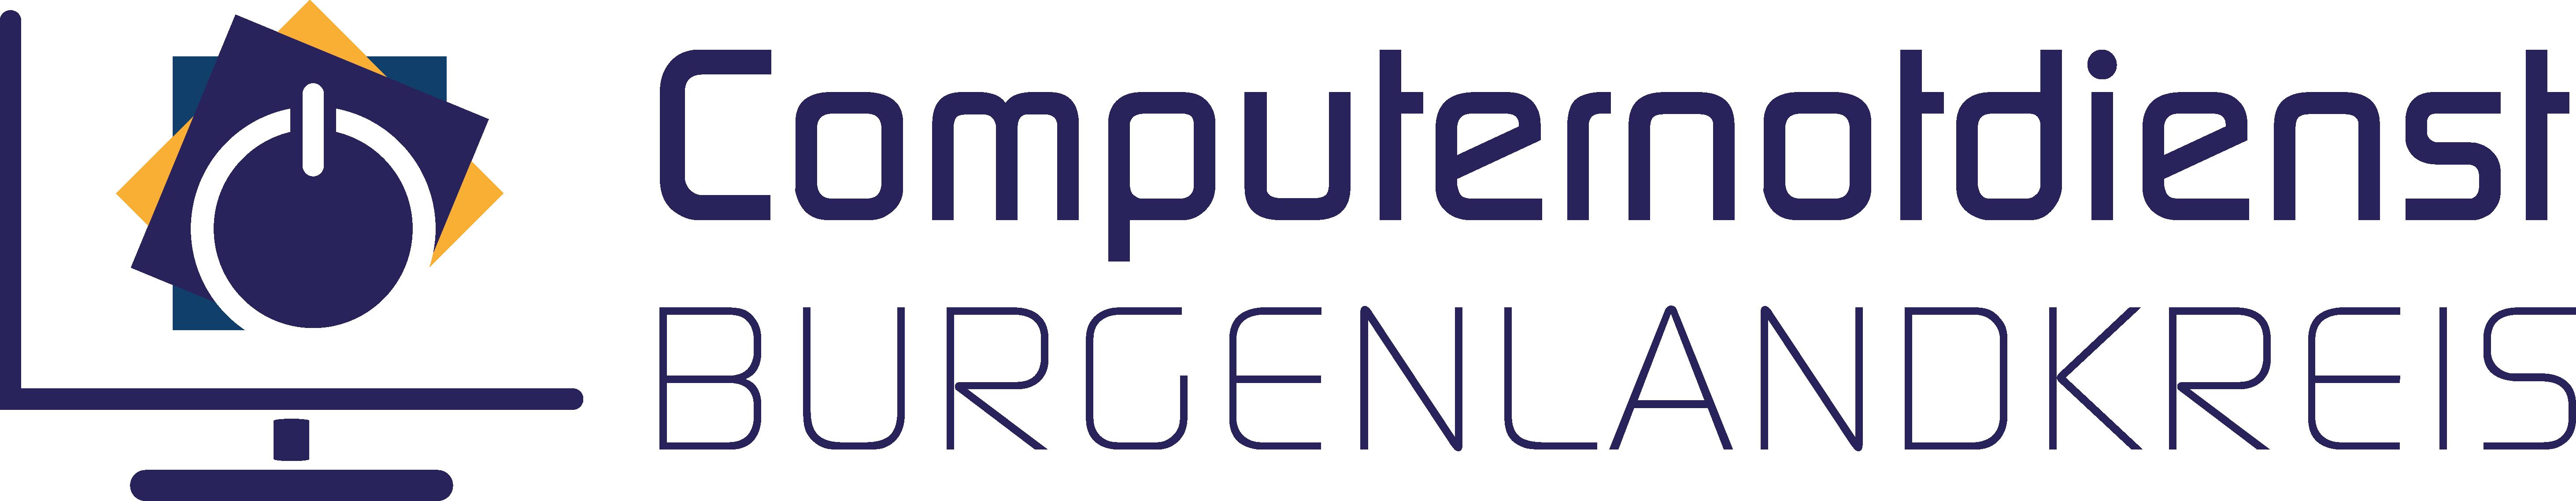 Logo_CMYK_Original_PNG